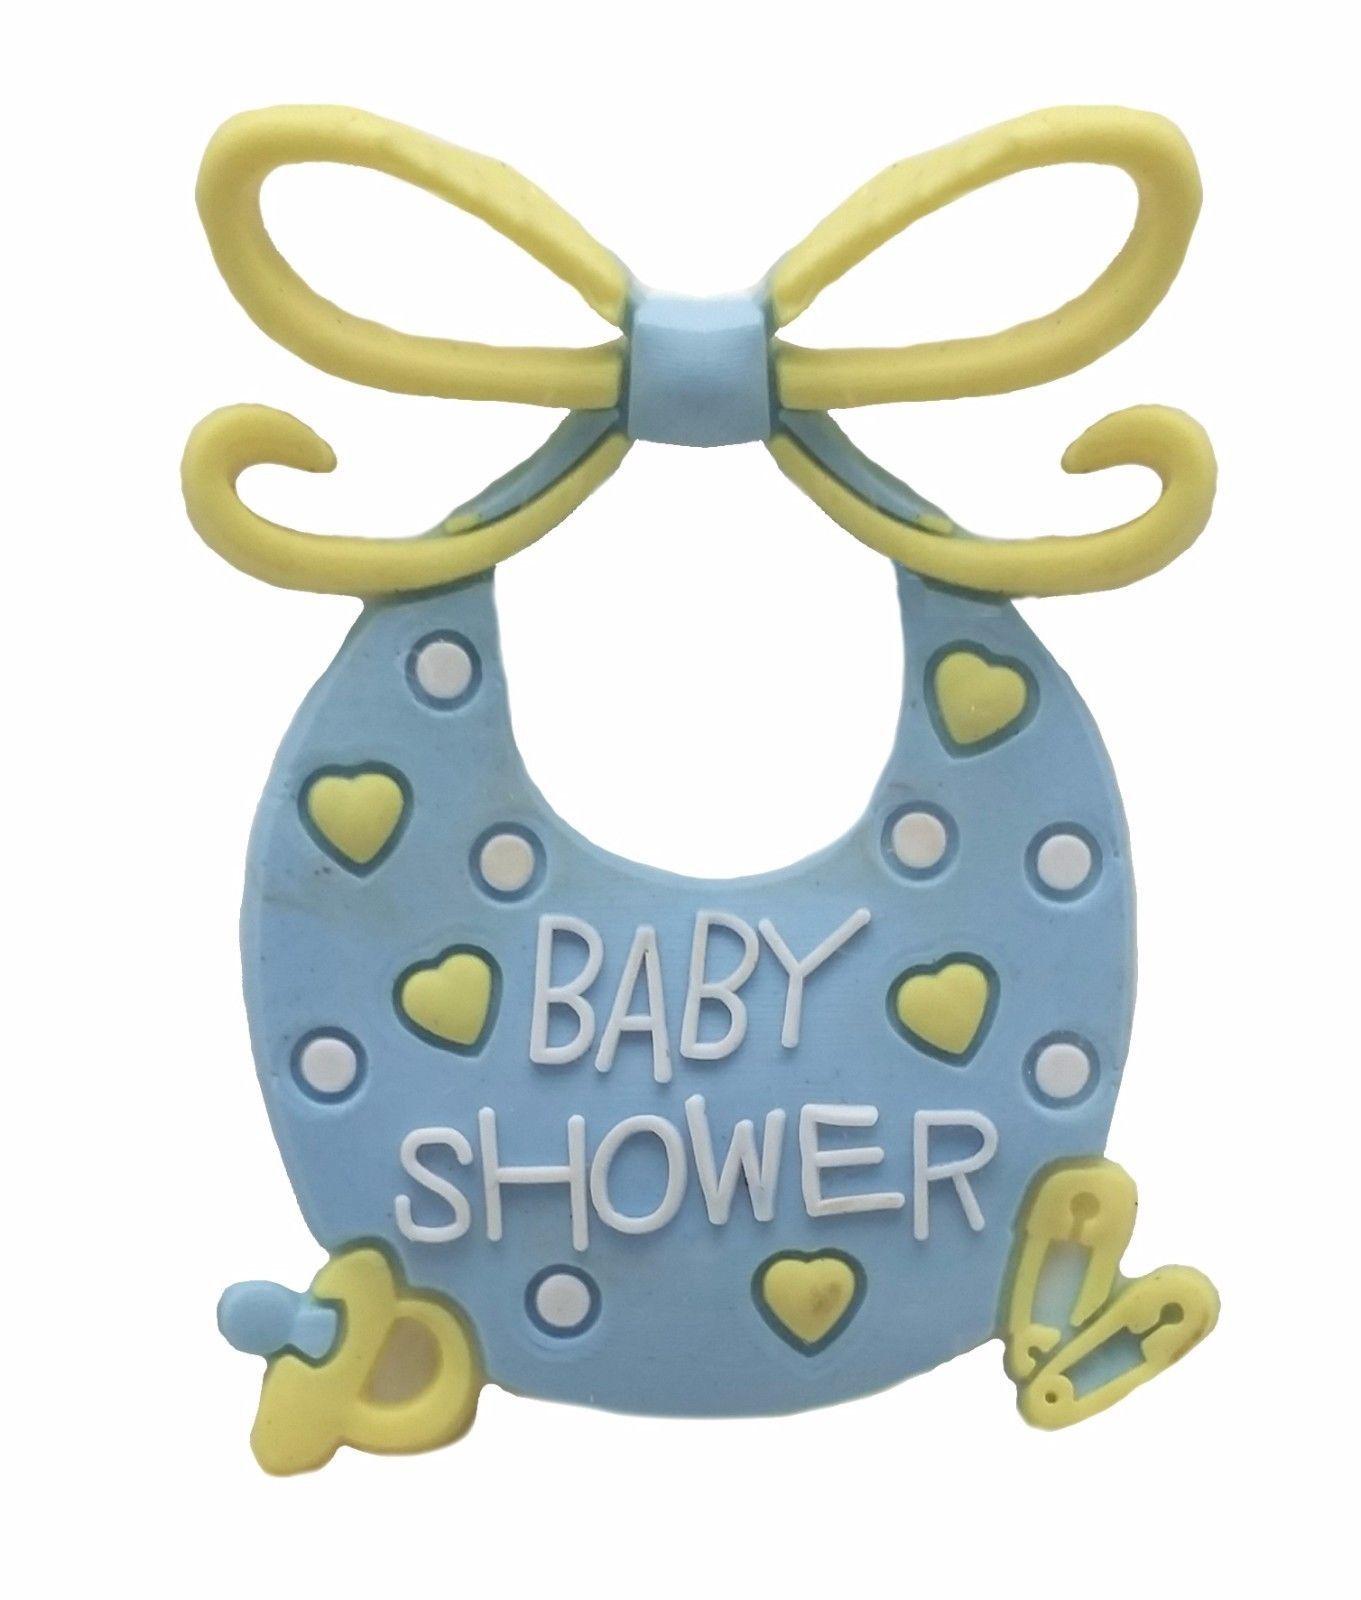 12 Flexible Pink Blue Bib baby shower favors appliques - 4 pk of 3